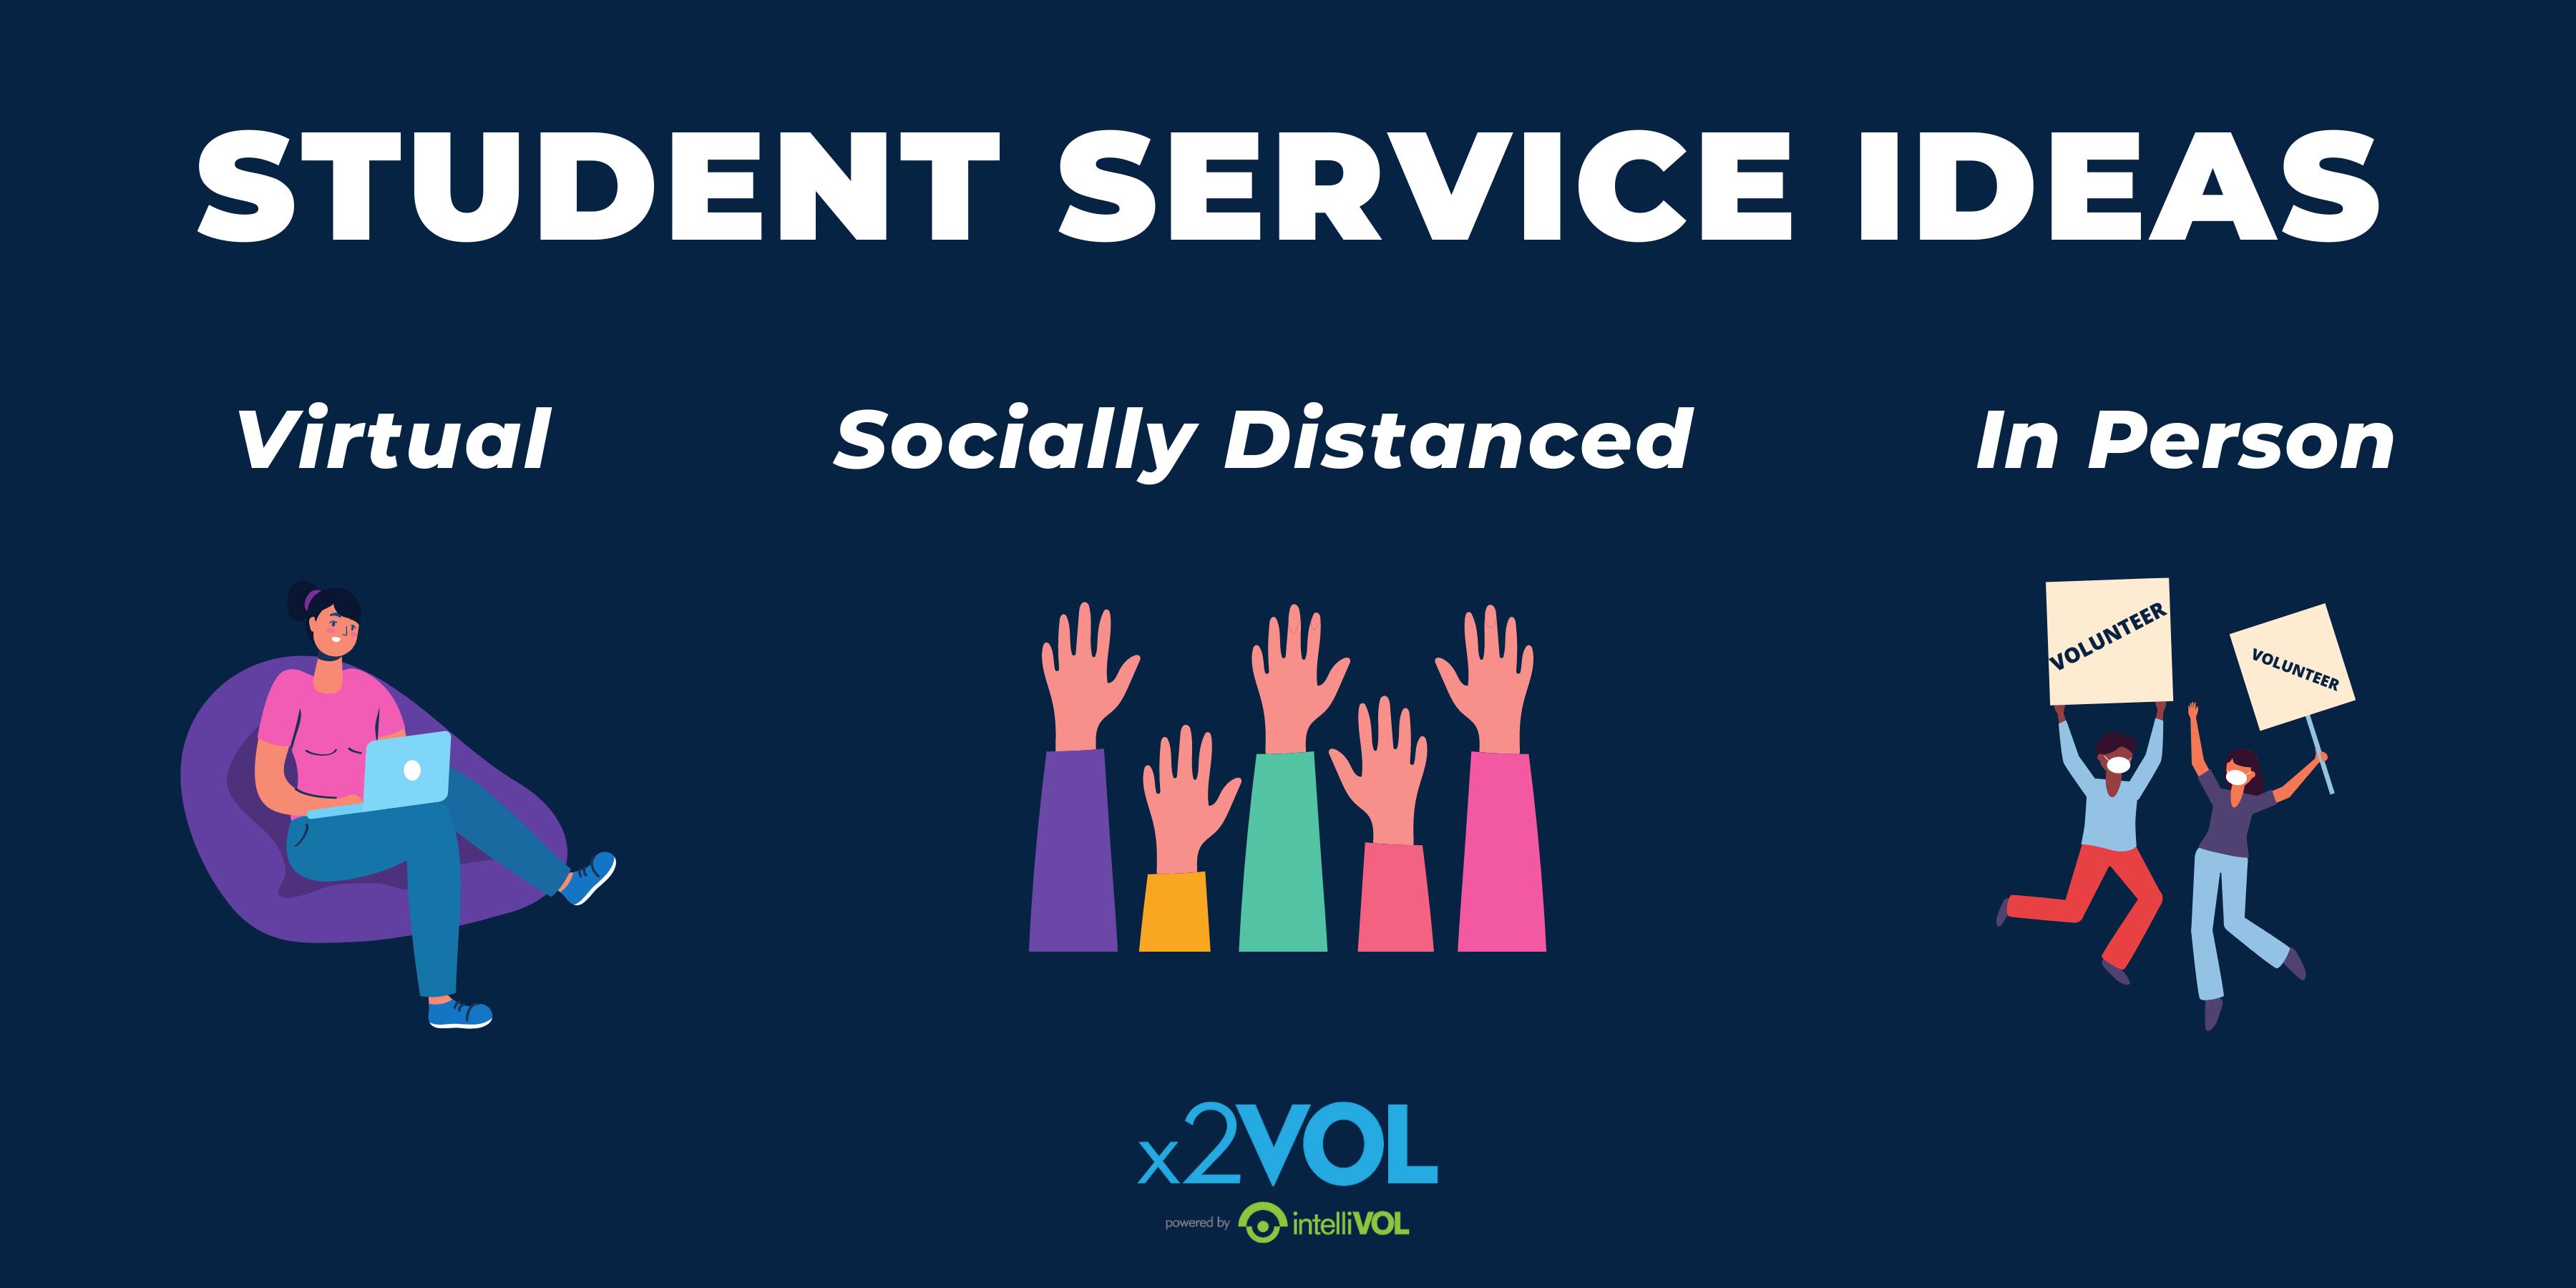 Student Service Ideas